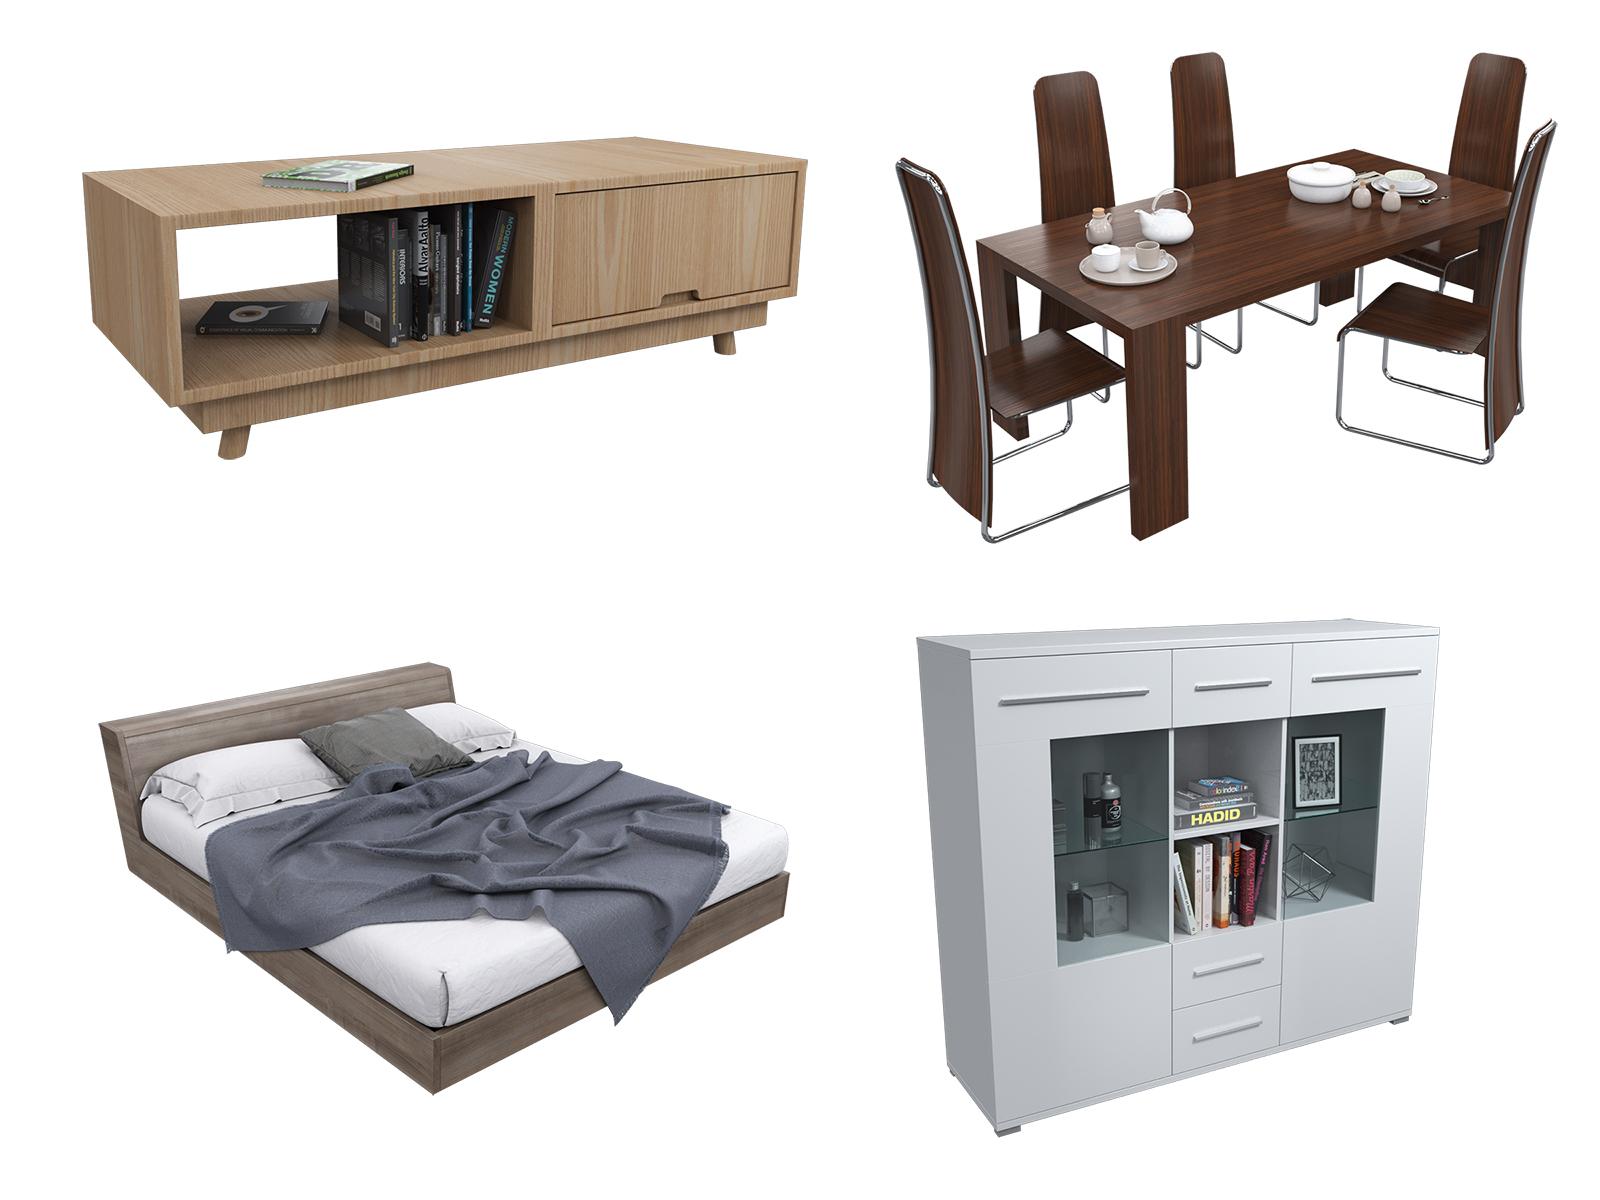 Моделирование и визуализация мебели